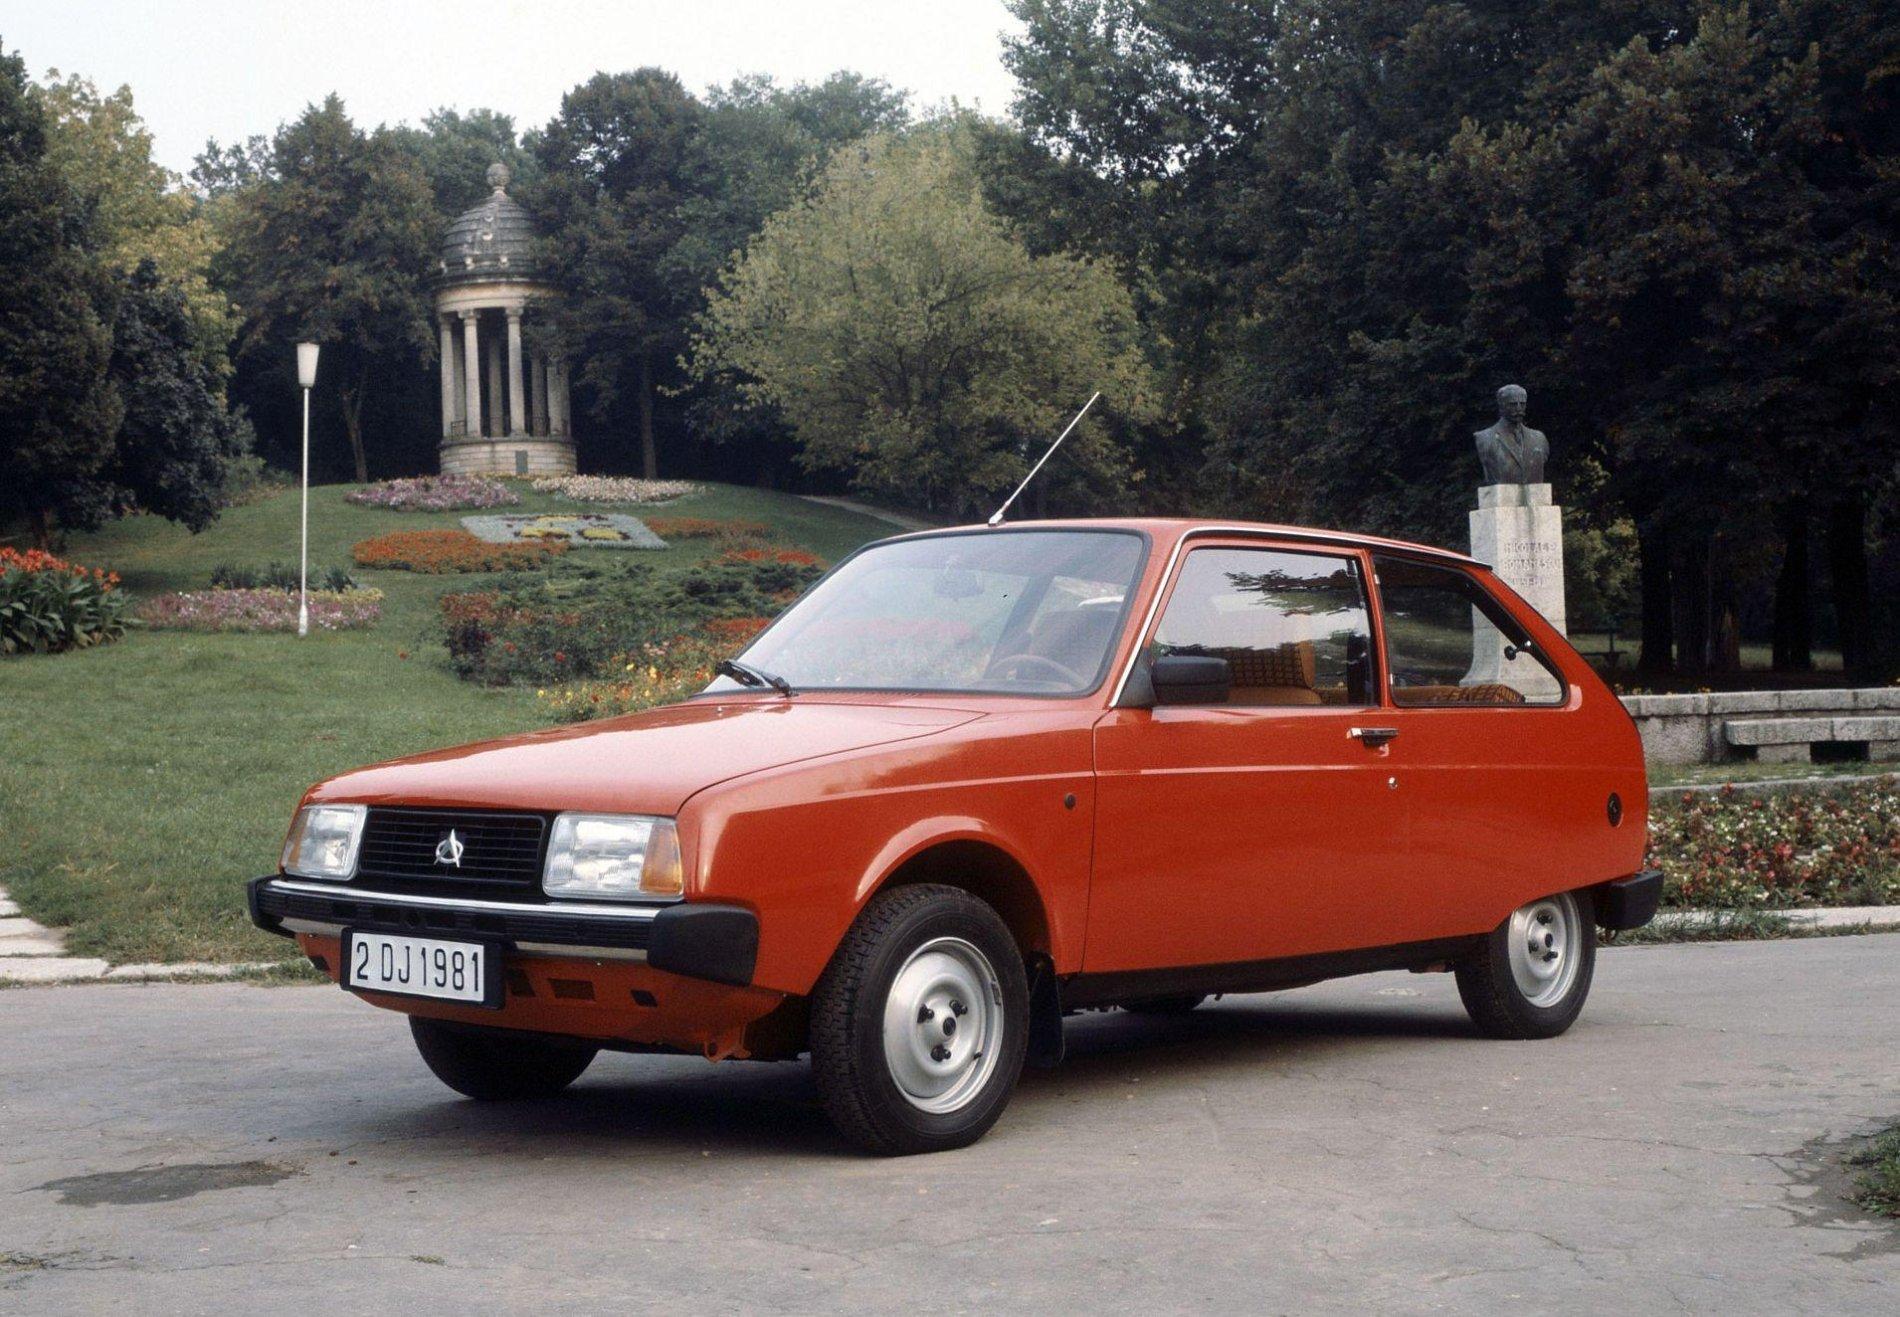 10 masini romanesti disparute pe care le-am vrea inapoi pe strazi - 10 masini romanesti disparute pe care le-am vrea inapoi pe strazi